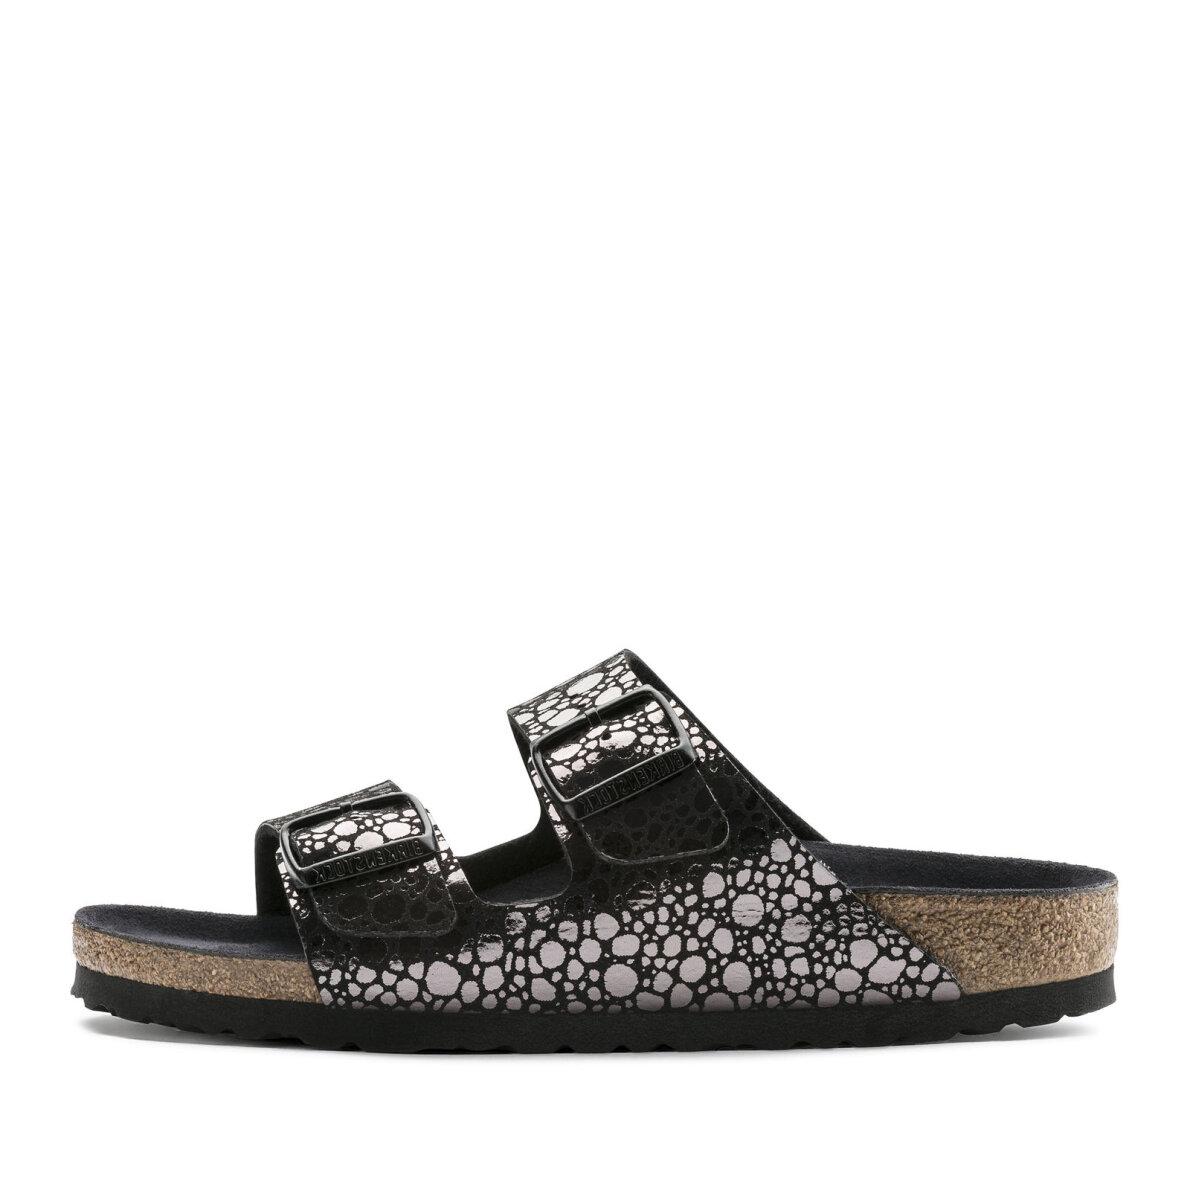 c8bb460eb719 Birkenstock - Birkenstock Arizona Metallic Stones Black dame sandal ...